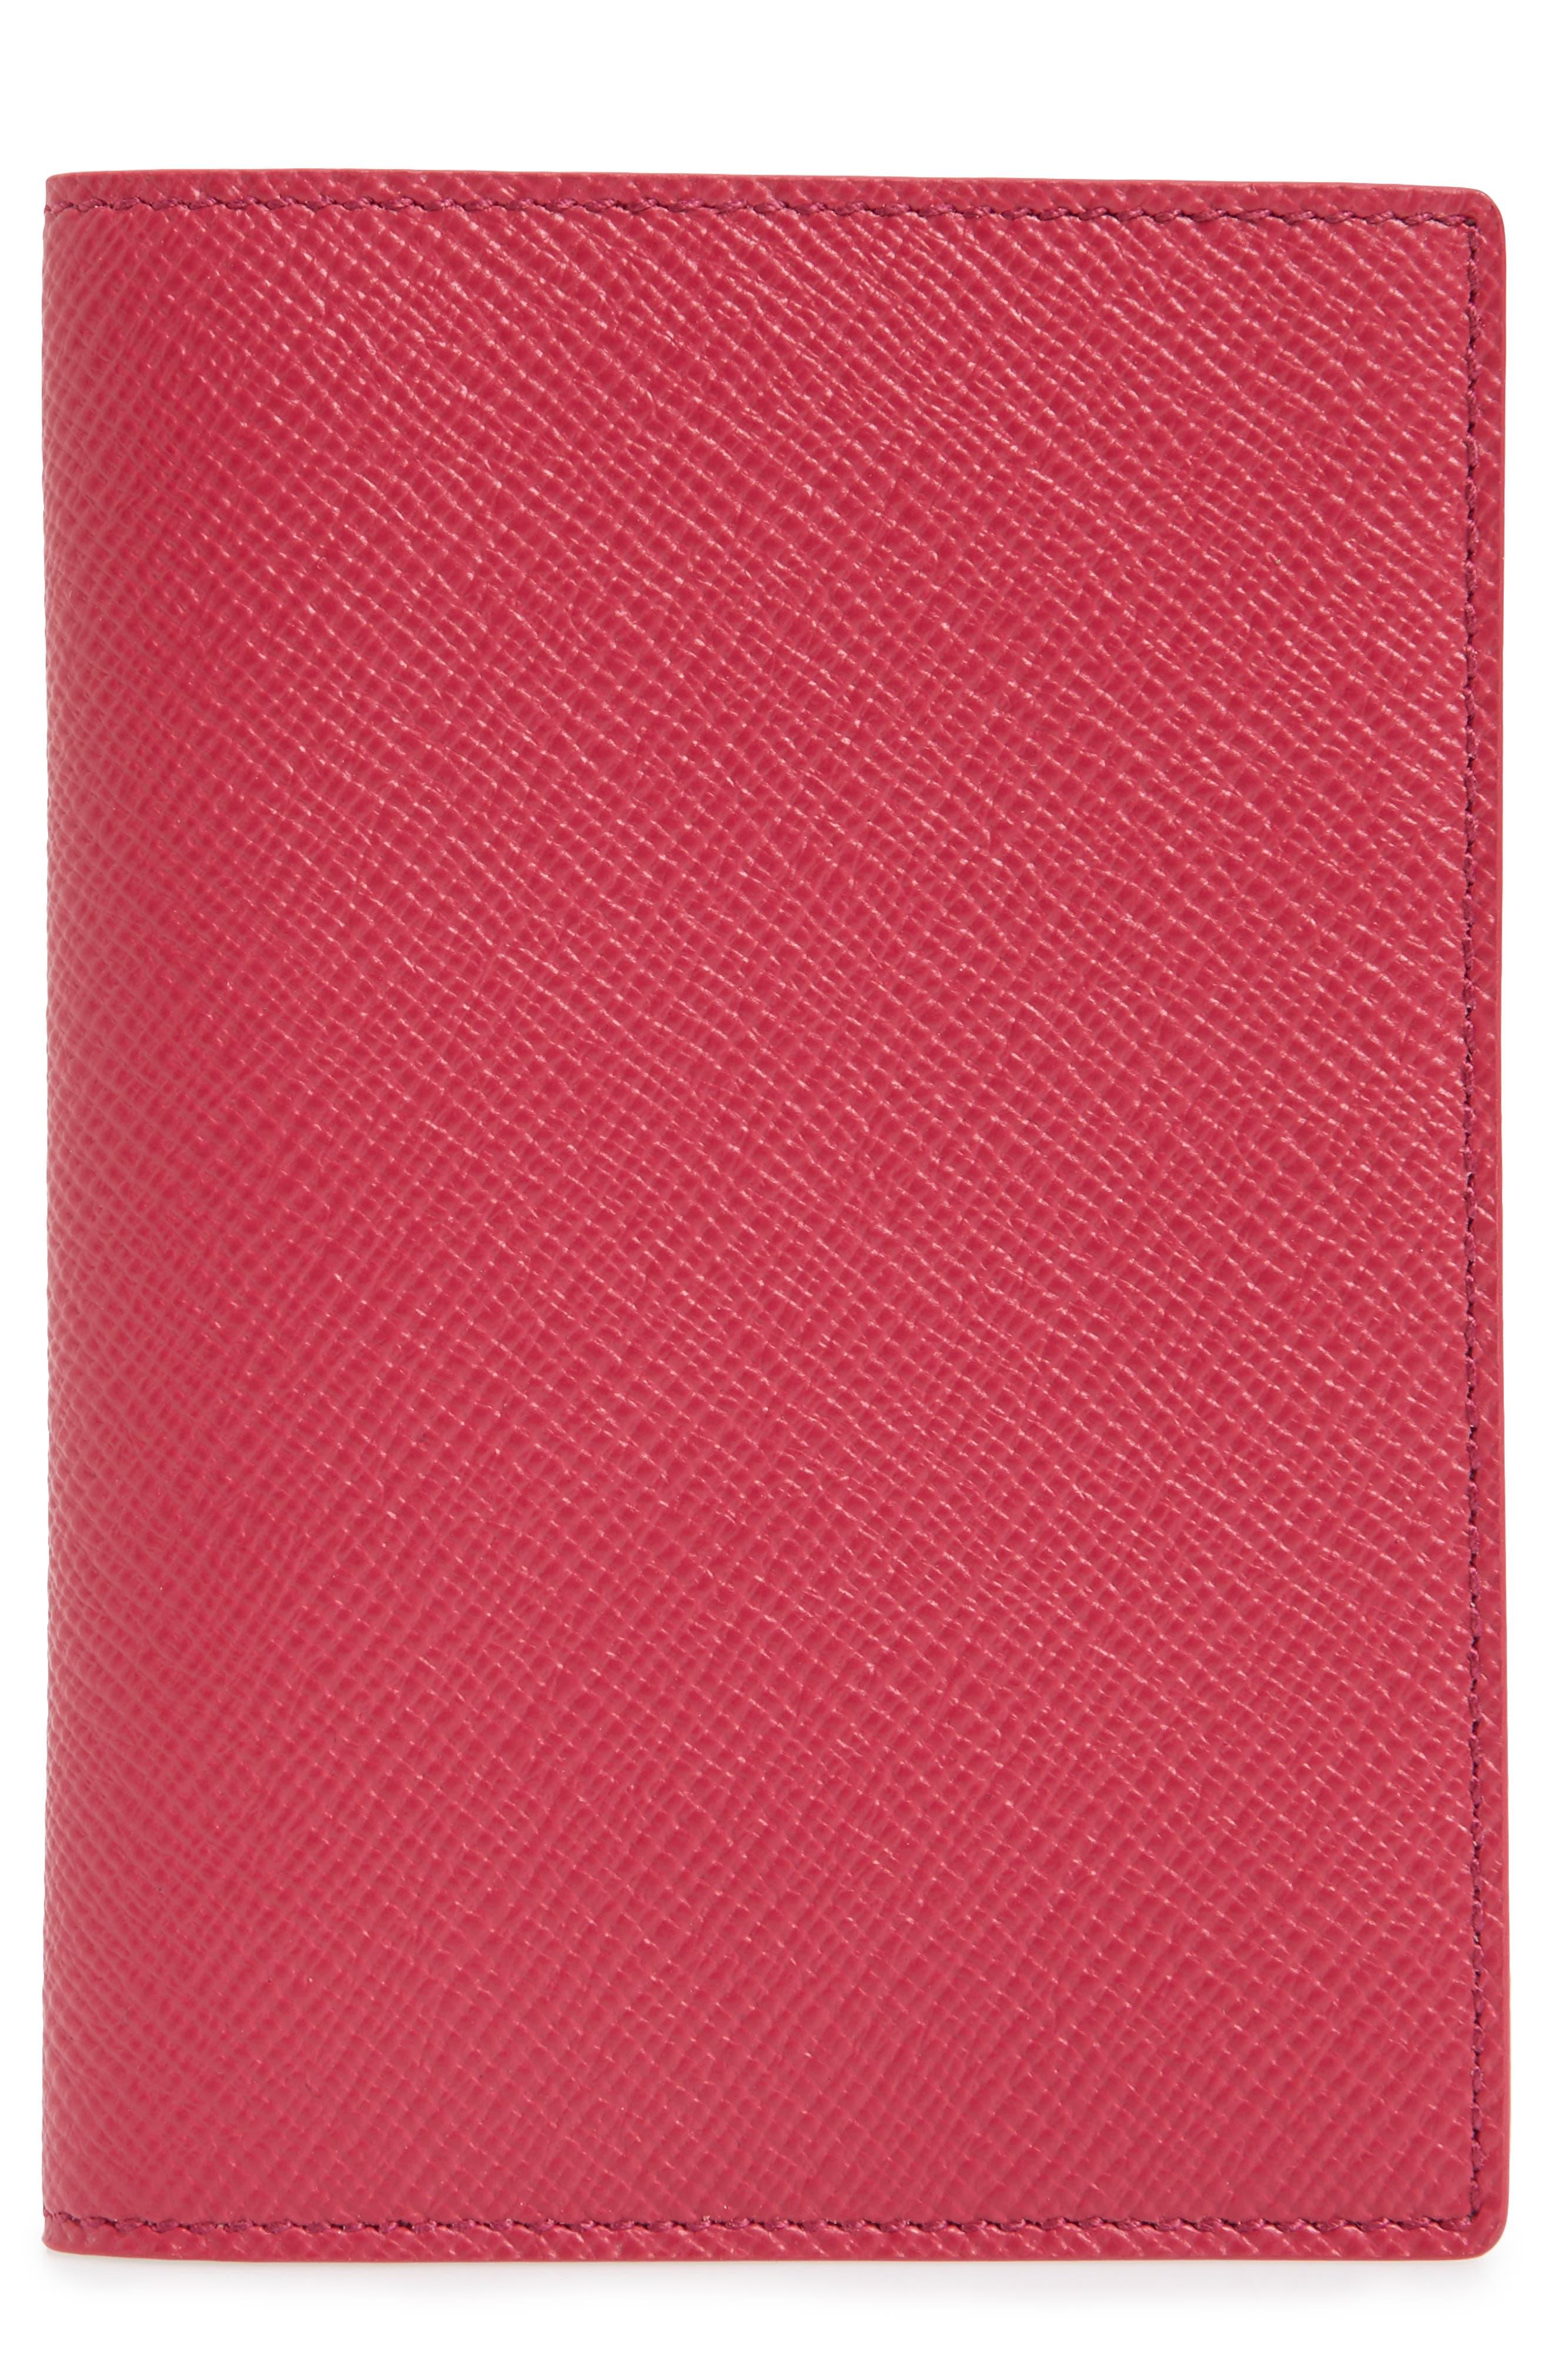 Panama Calfskin Leather Passport Holder, Main, color, 650